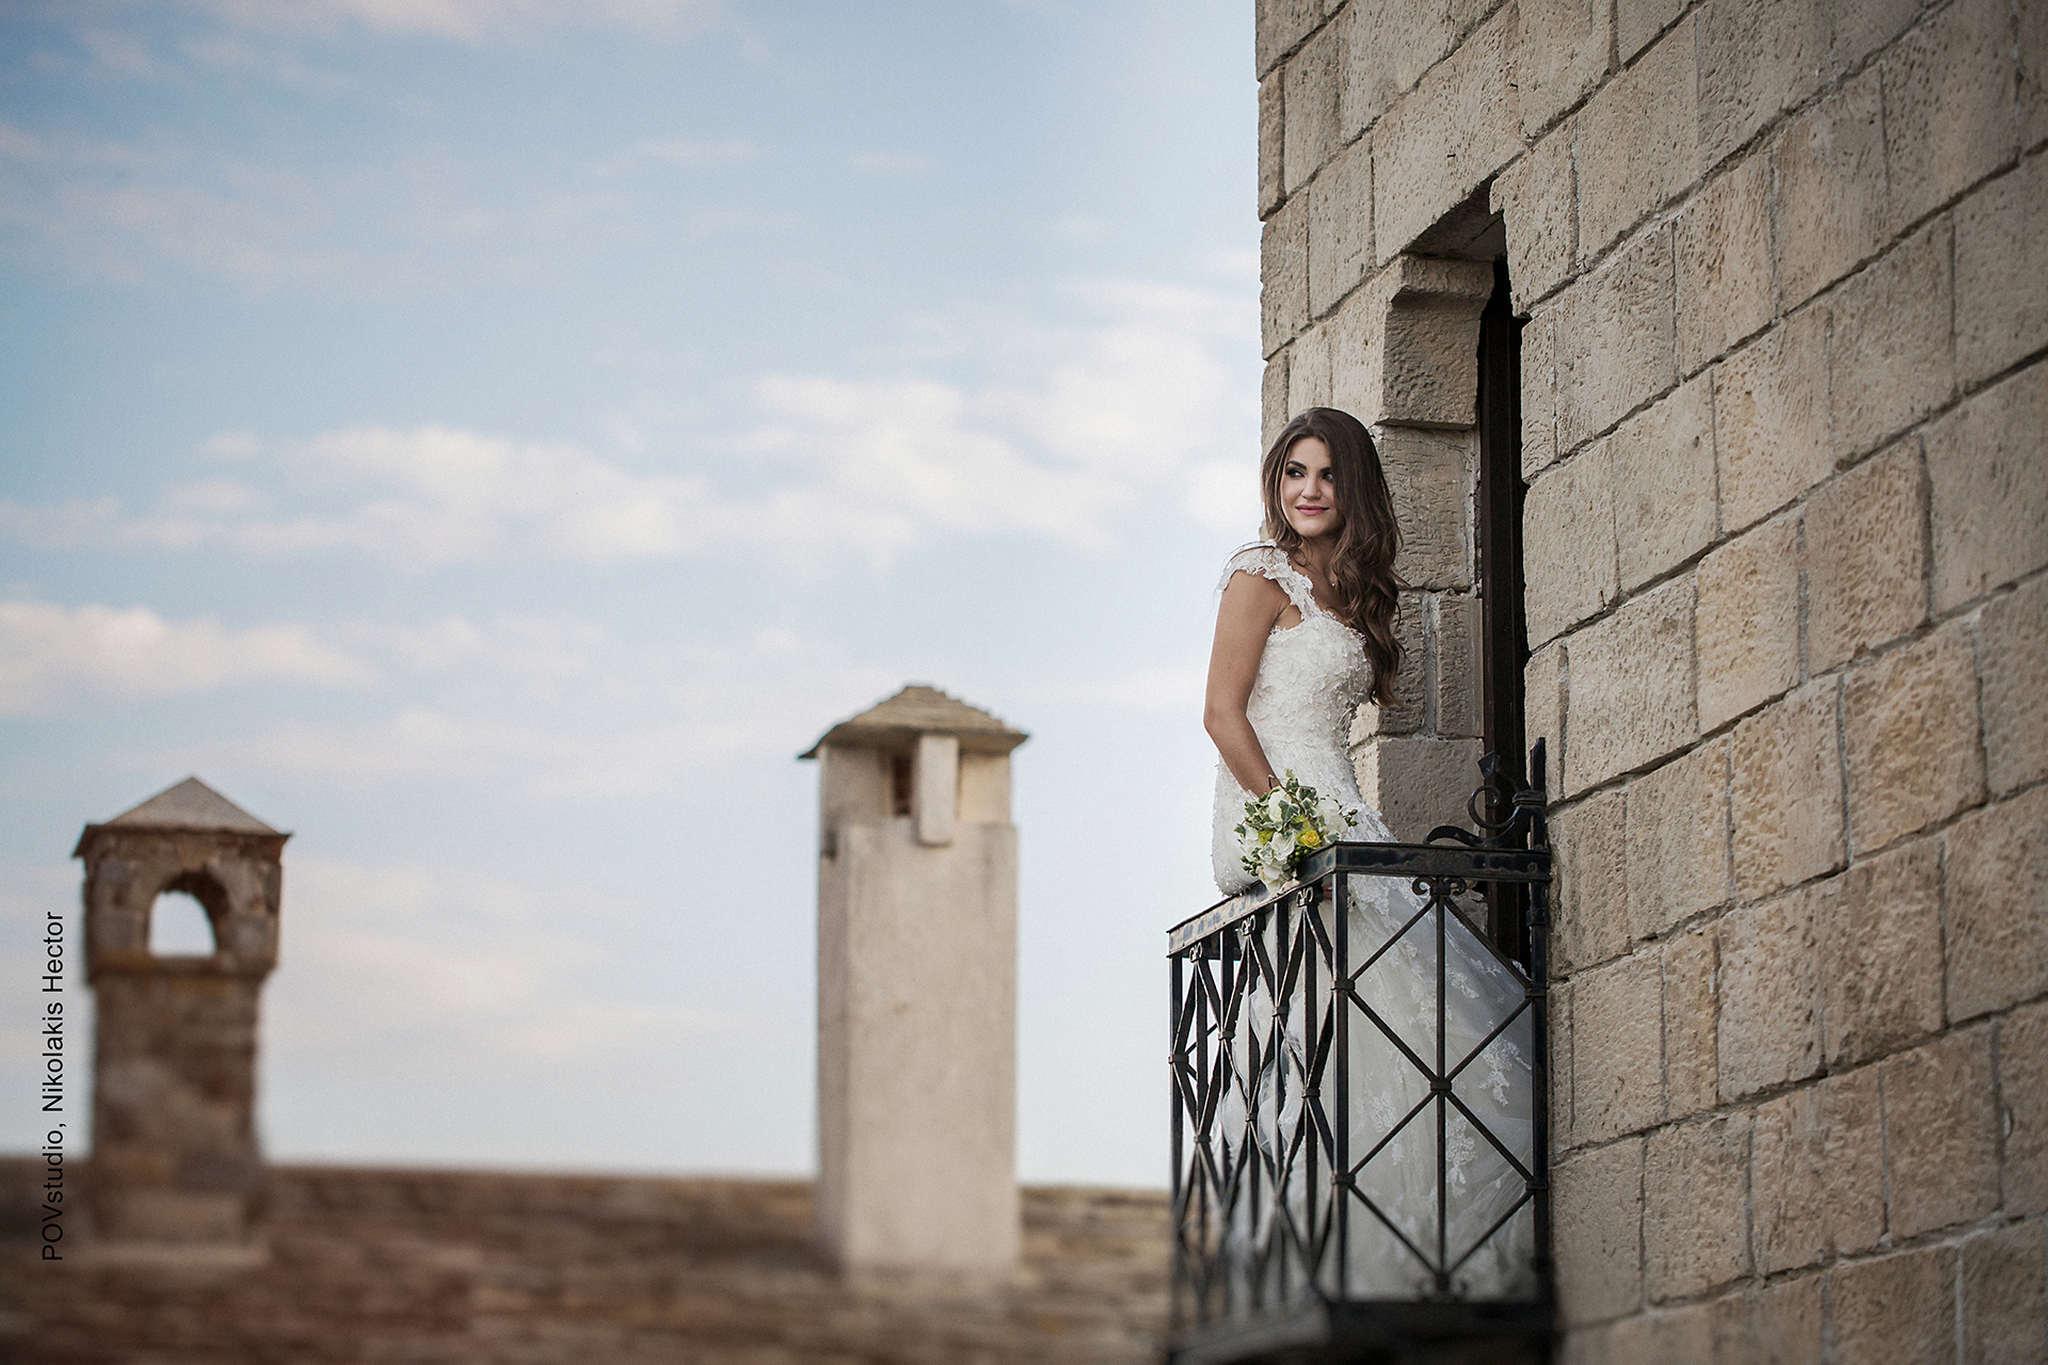 Meet one of the best wedding villas in Greece!